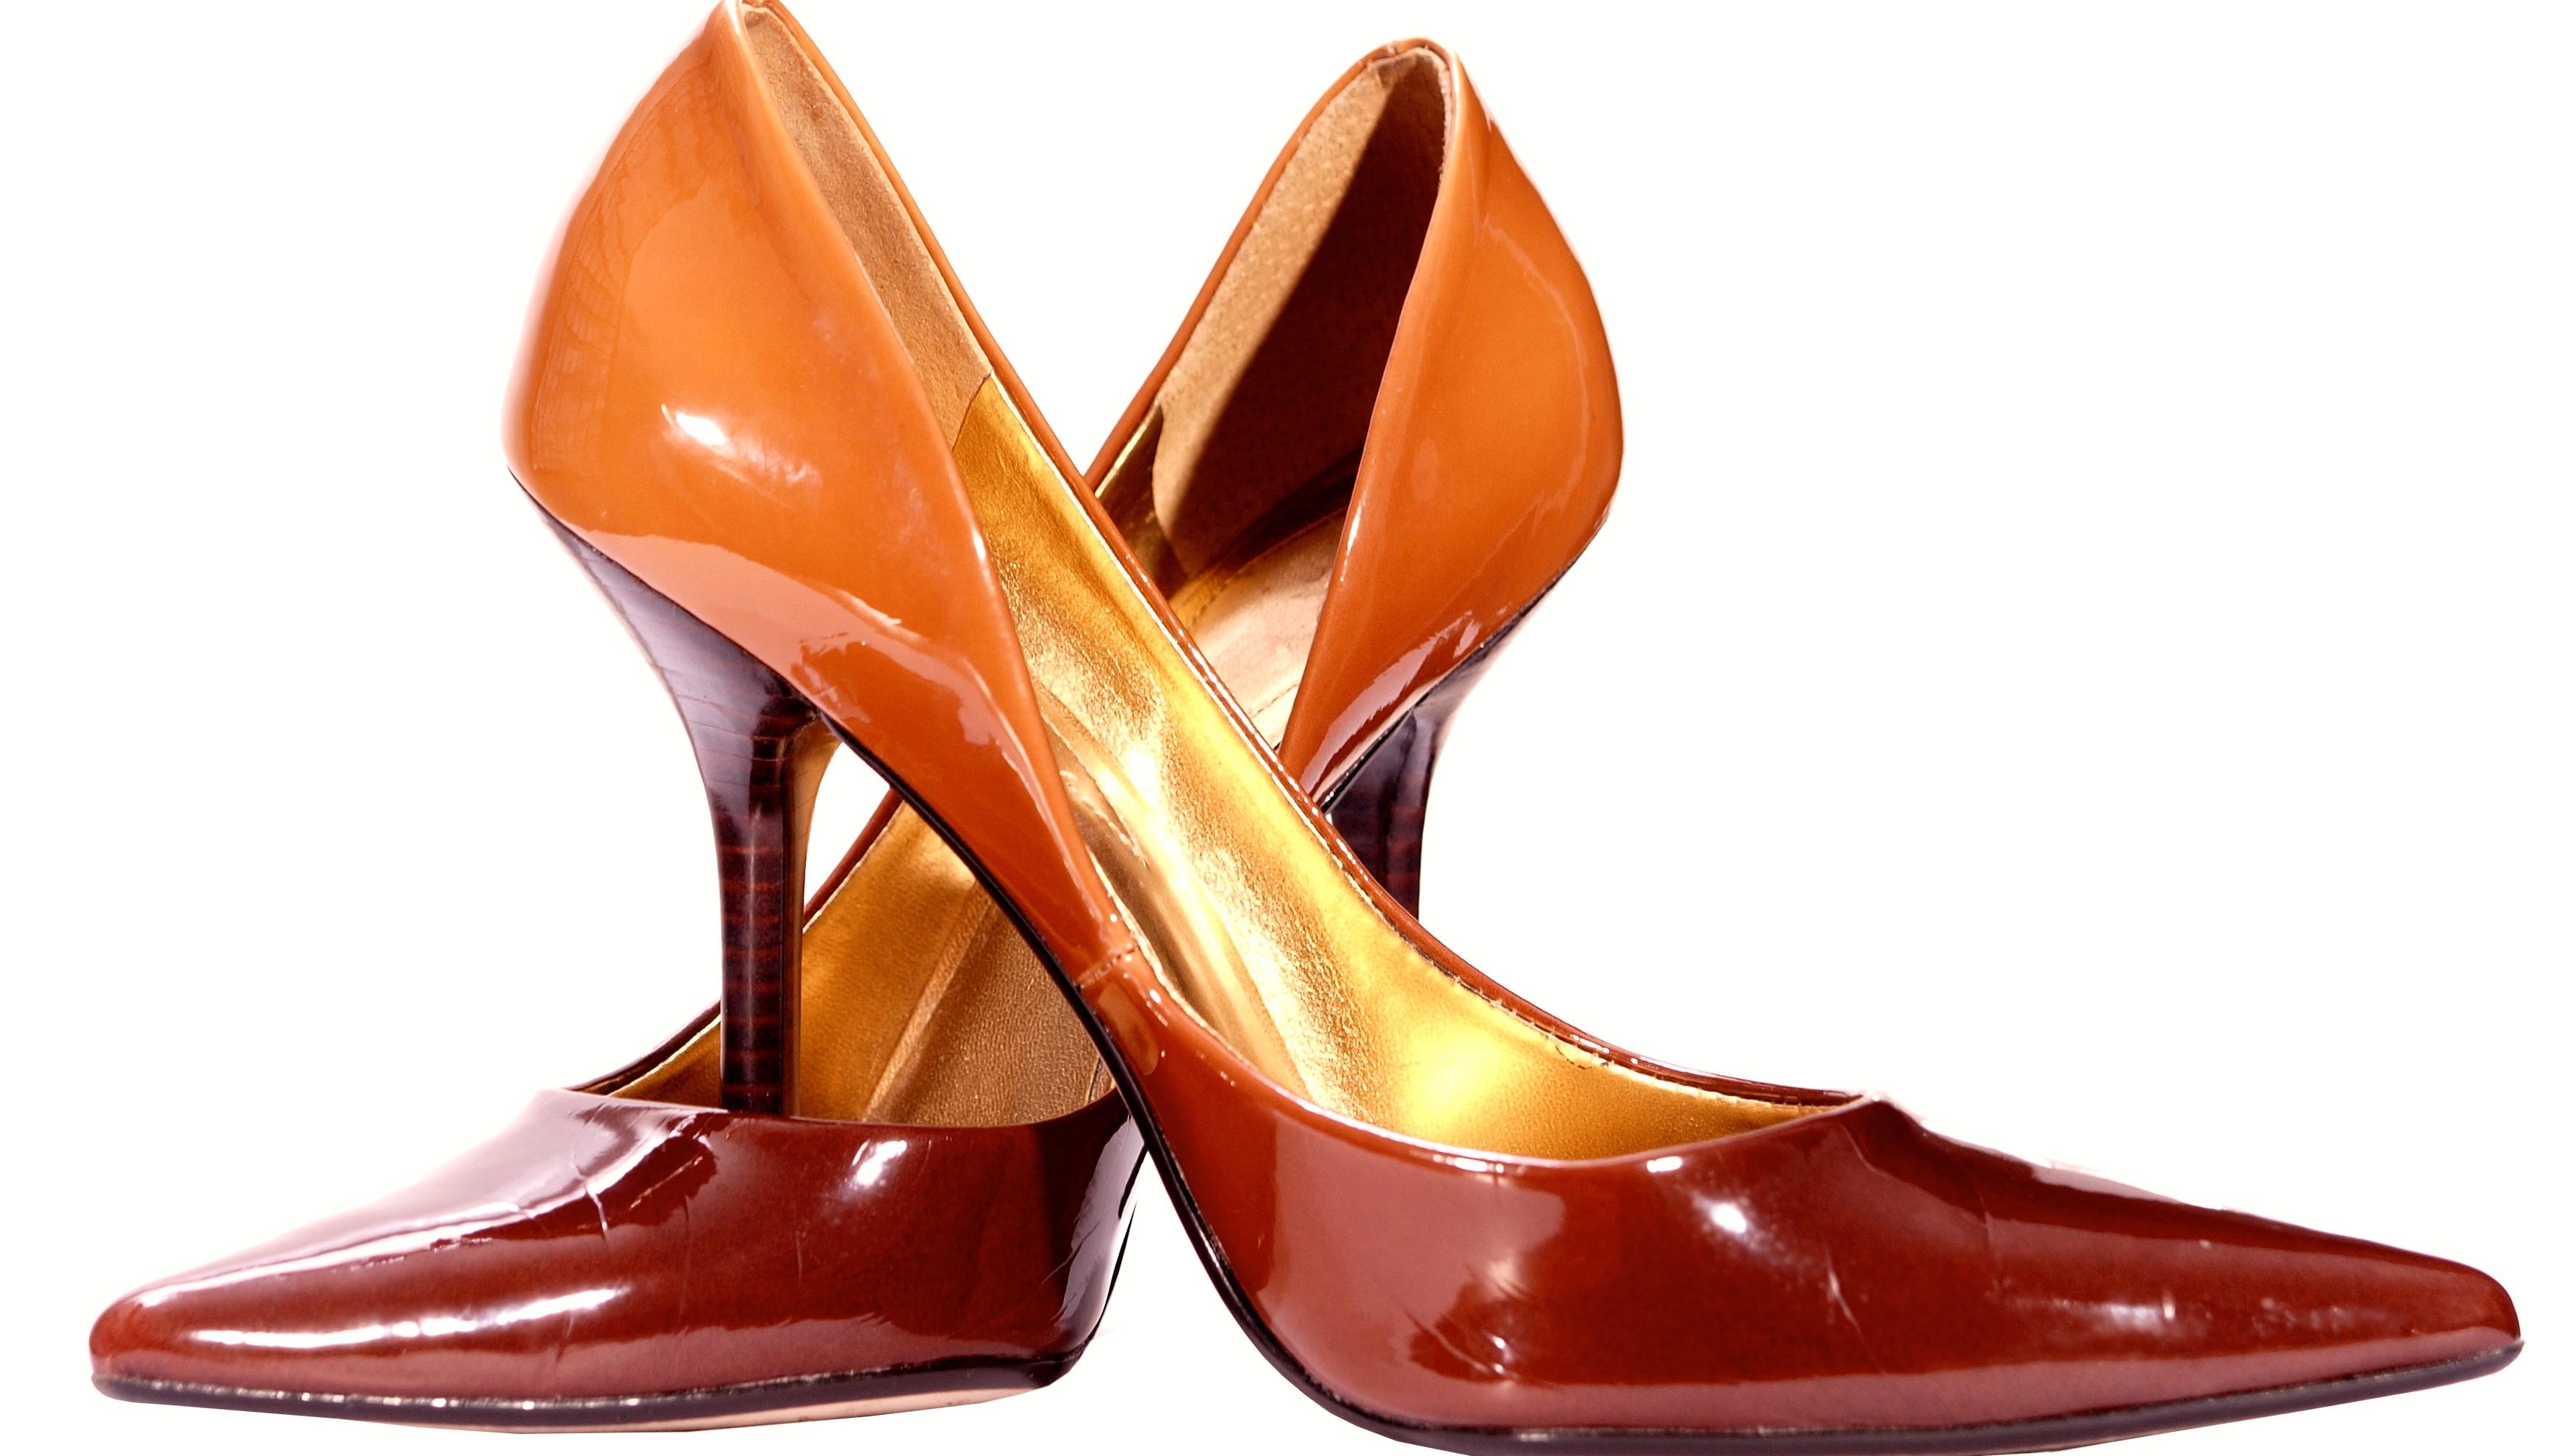 Un paio di scarpe eleganti da donna